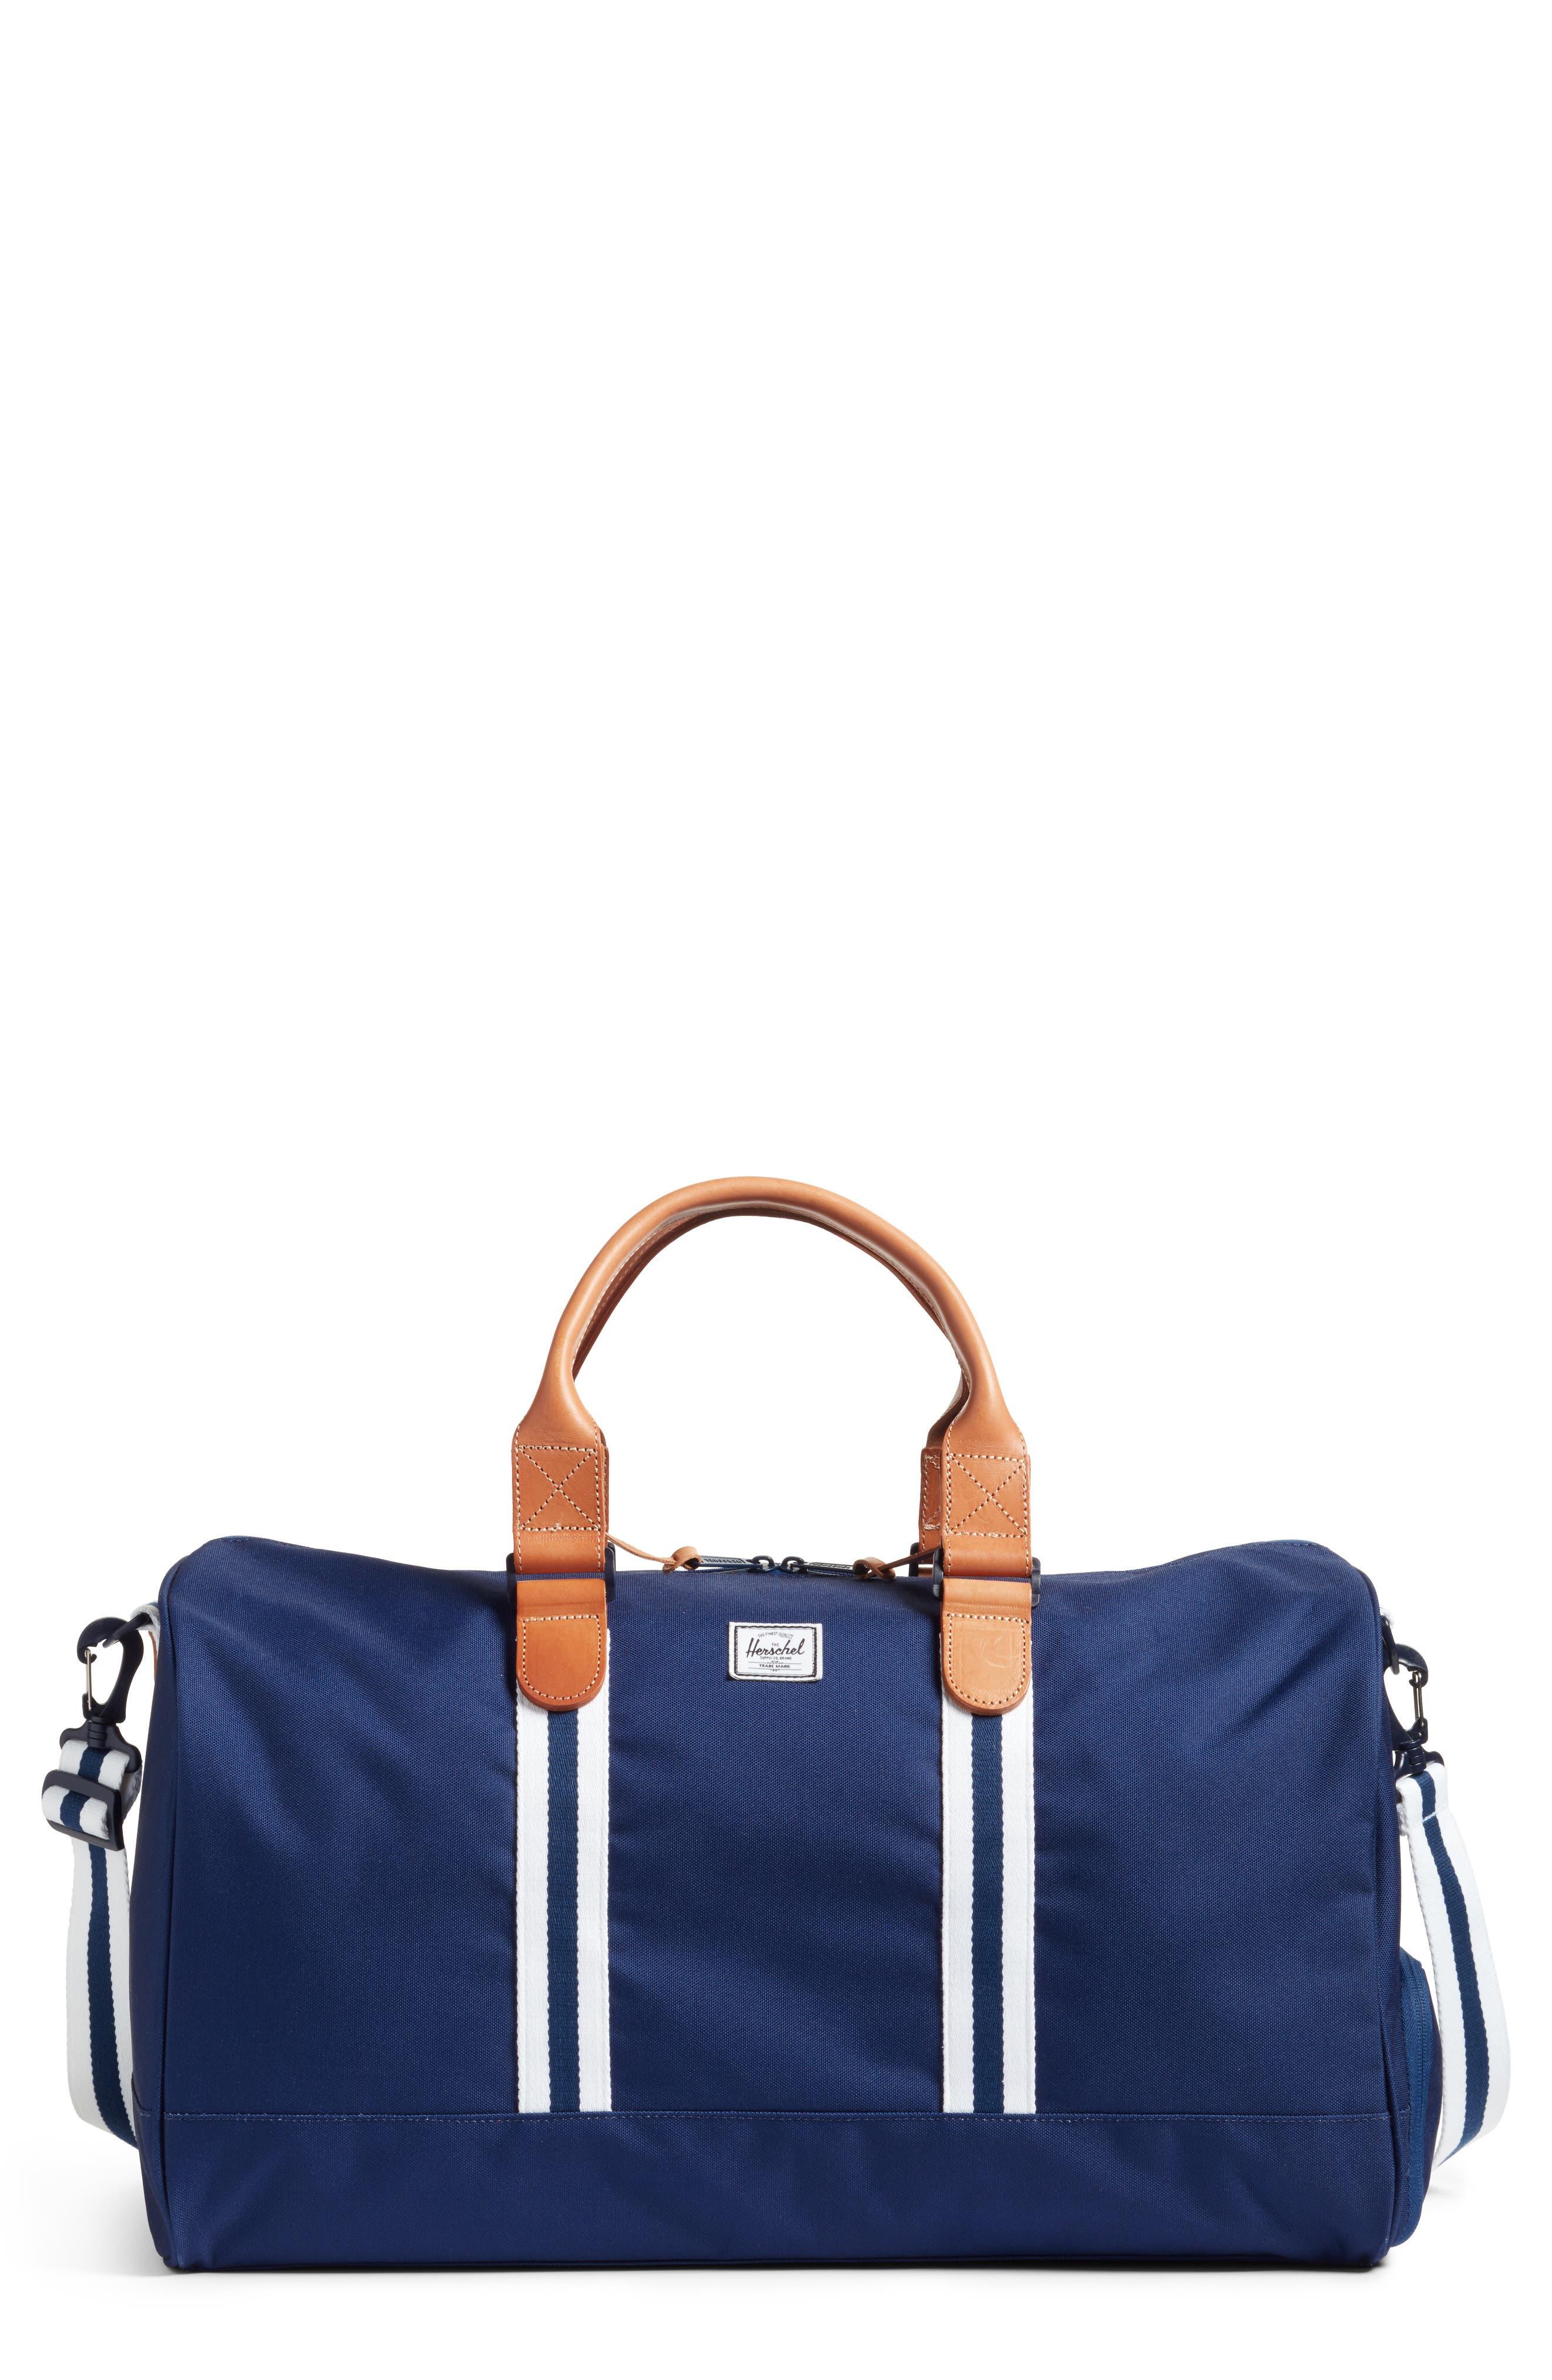 Novel Duffel Bag,                             Main thumbnail 1, color,                             Blue Depths